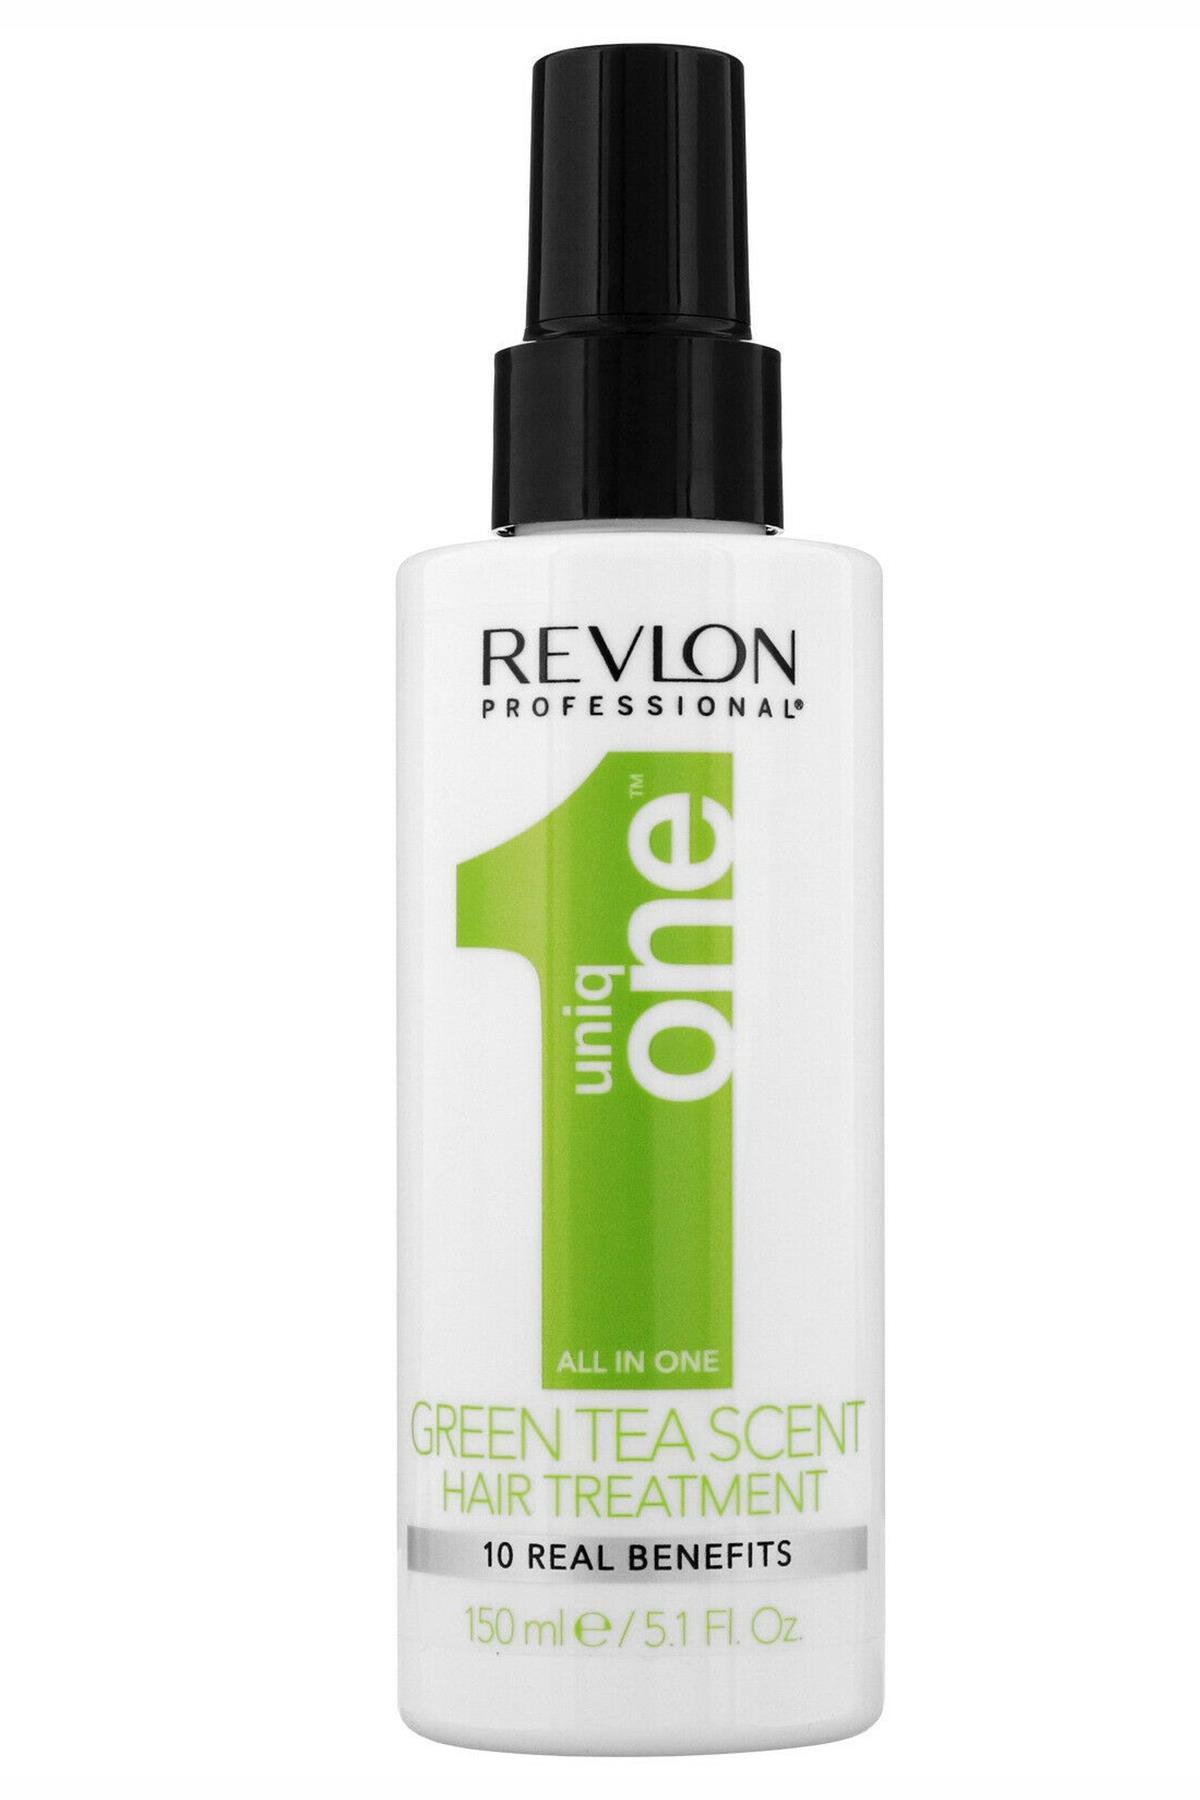 Revlon Uniq One Green Tea Yeşil Çay Saç Bakım Spreyi 150 ml